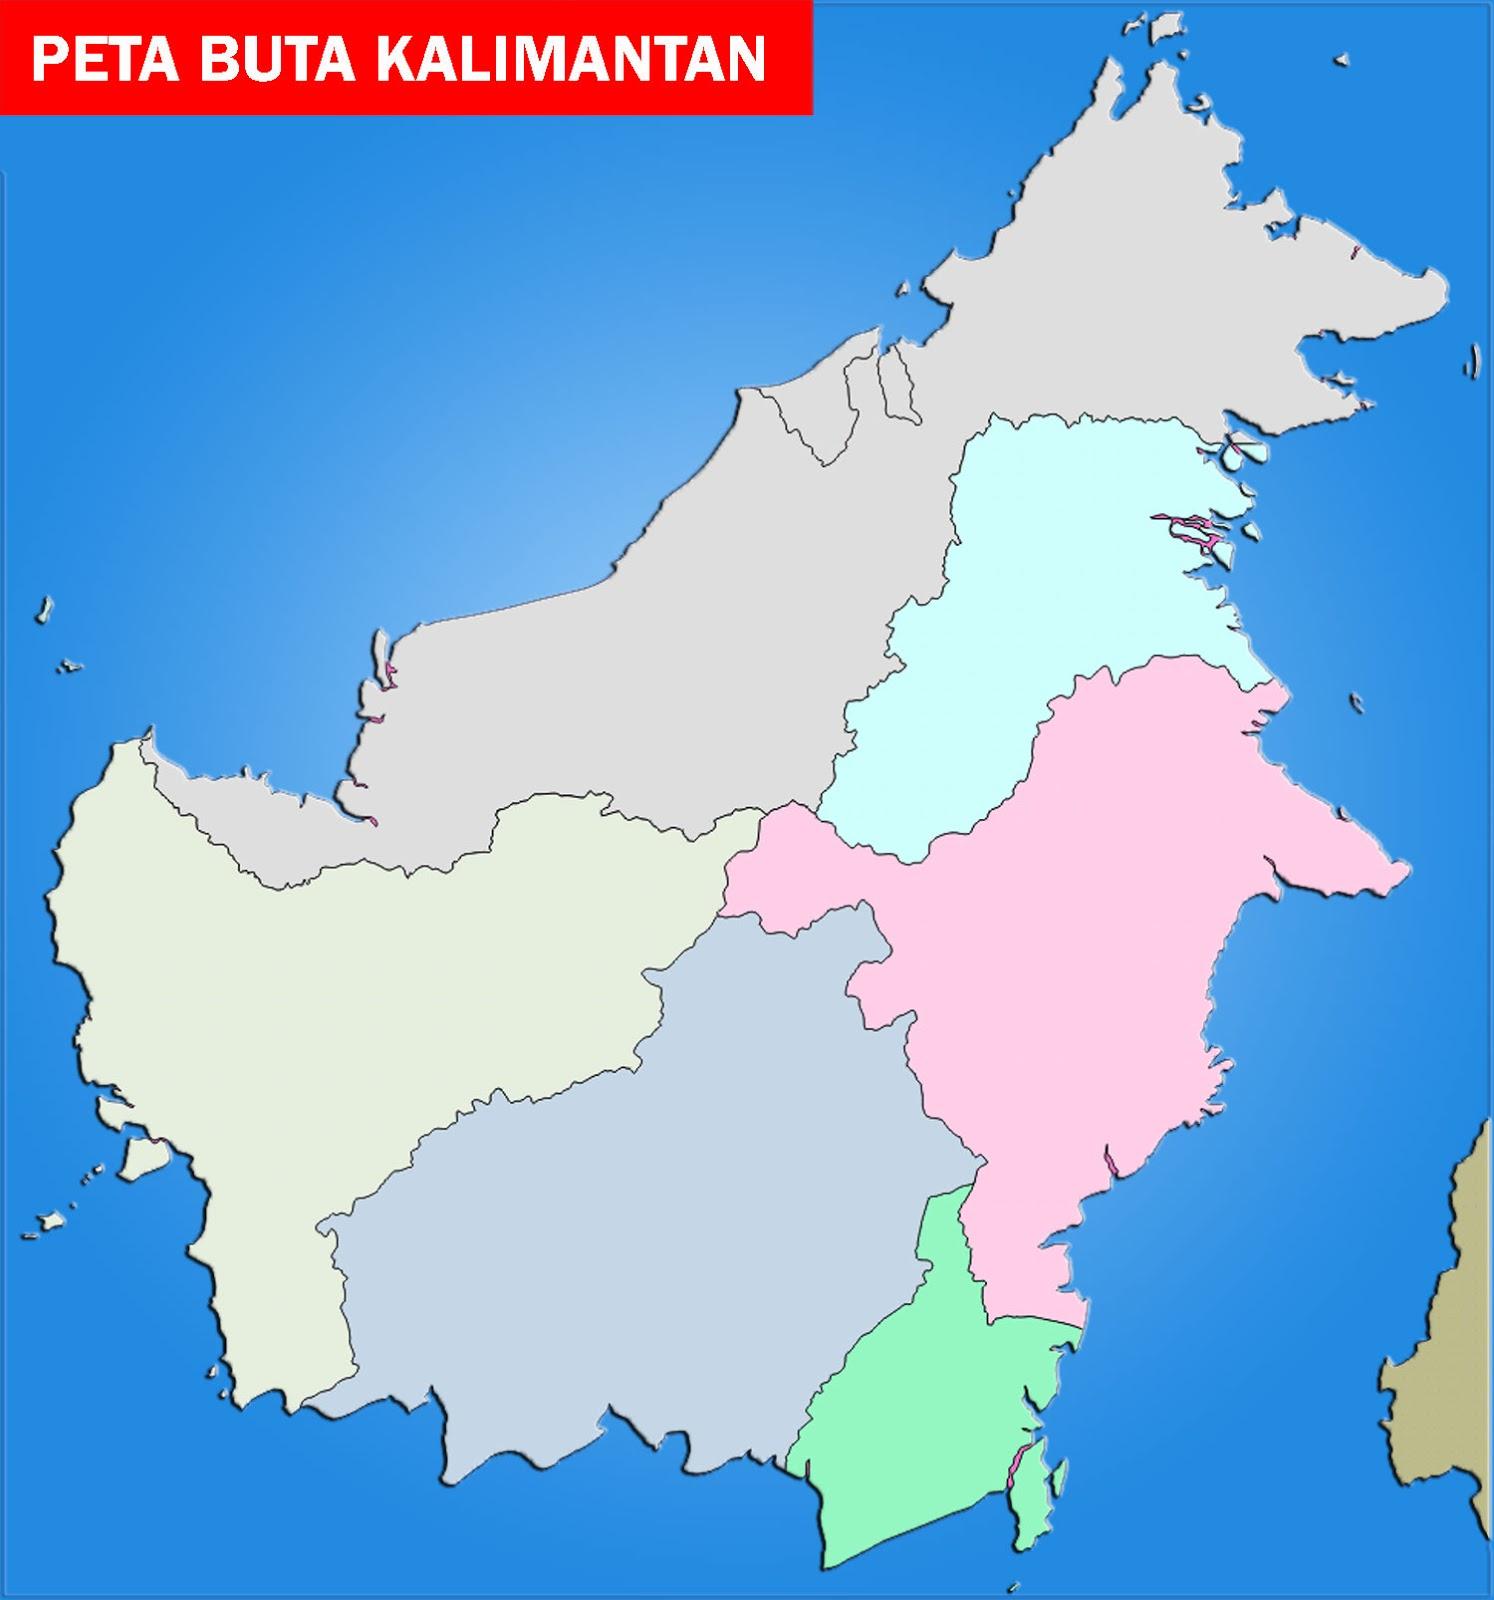 Download Gambar Sketsa Pulau Kalimantan